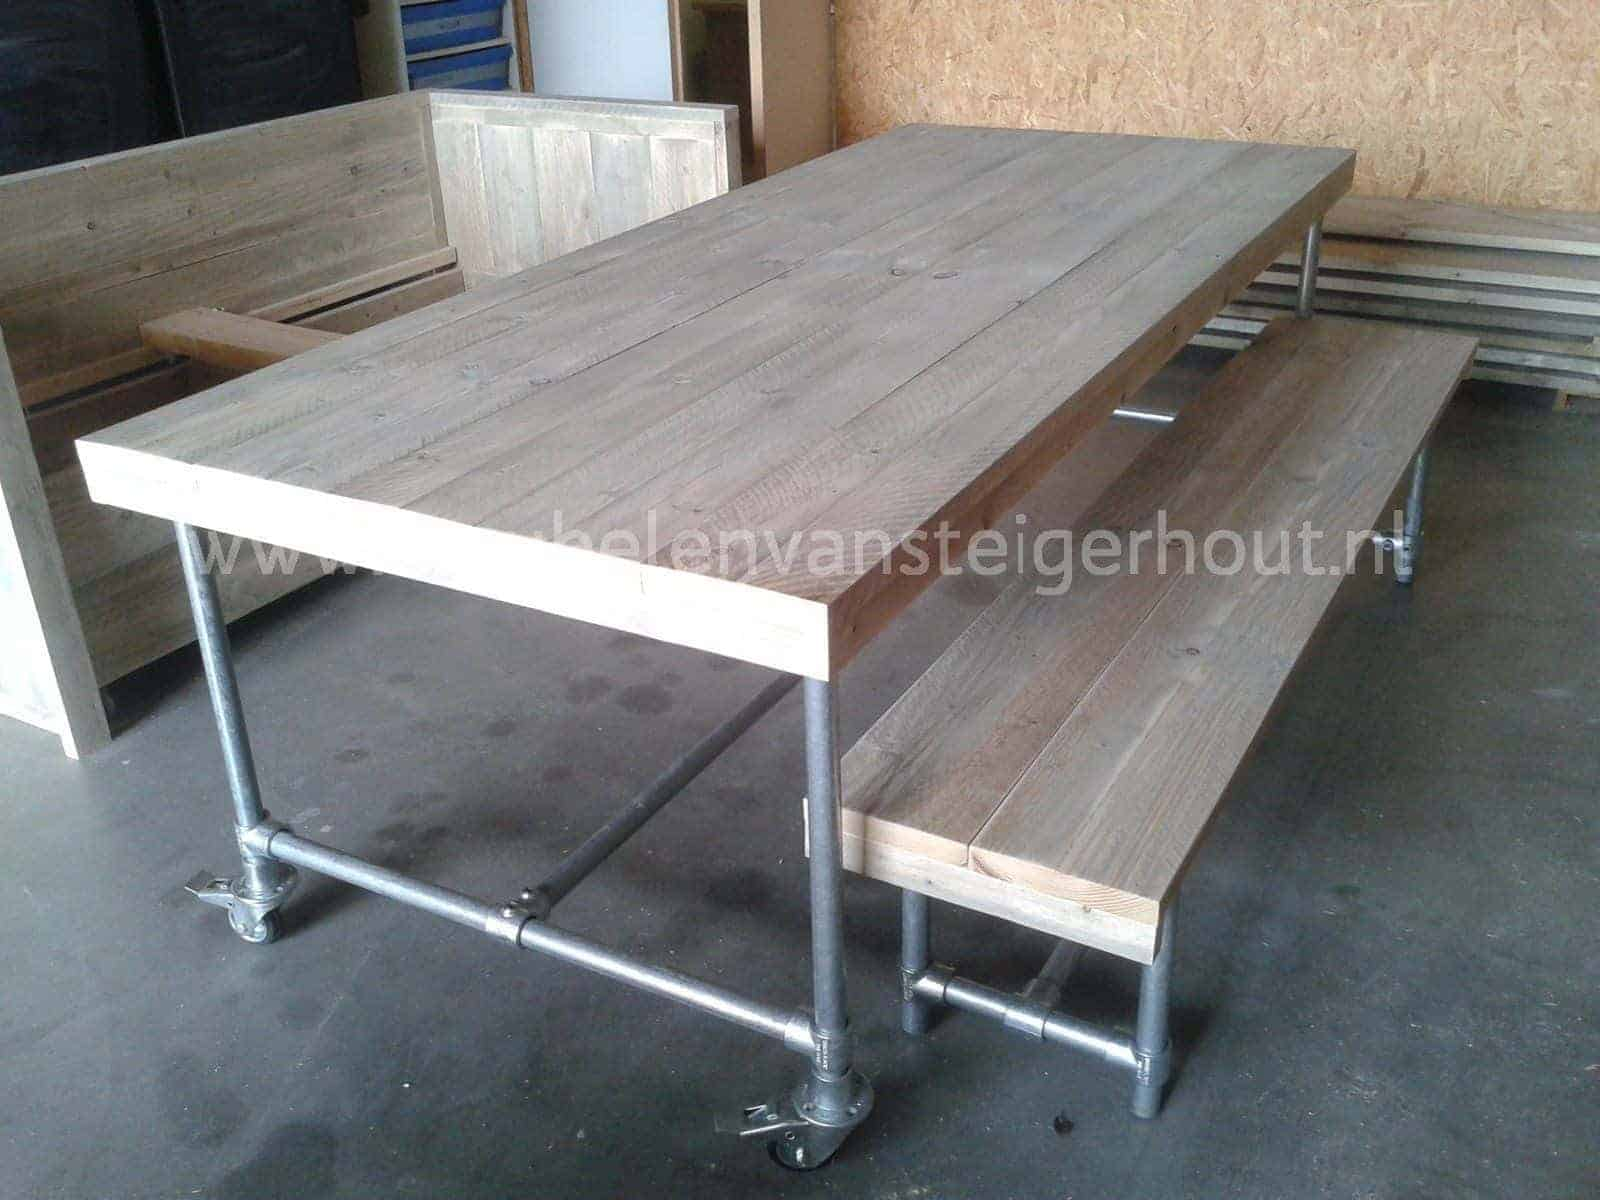 Tafel met wielen. mobiele inklapbare tafel ingeklapte with tafel met